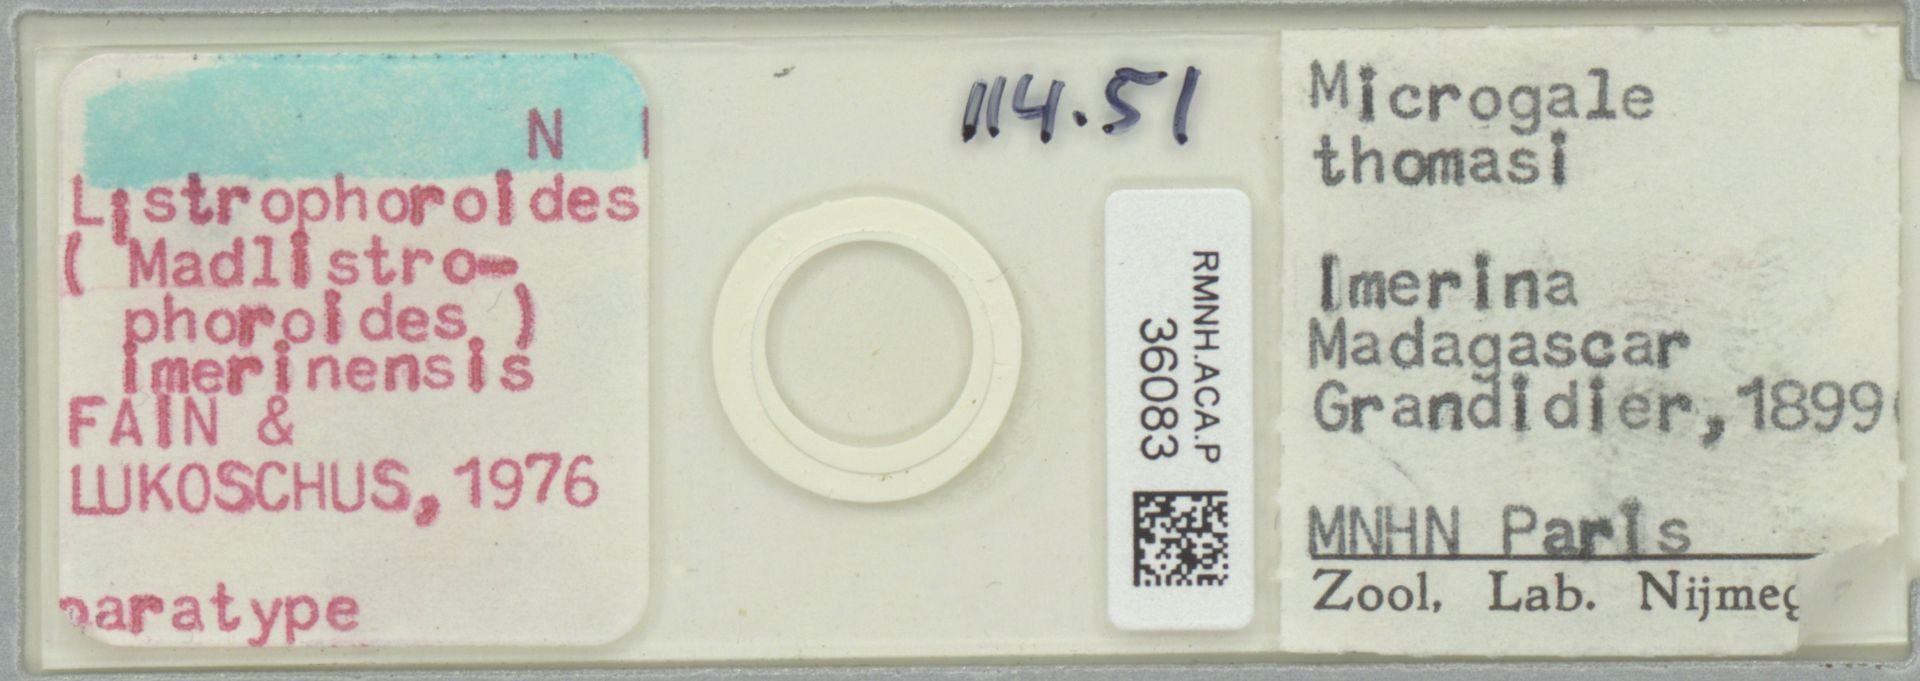 RMNH.ACA.P.36083 | Listrophoroides (Madlistrophoroides) imerinensis Fain & Lukoschus, 1976